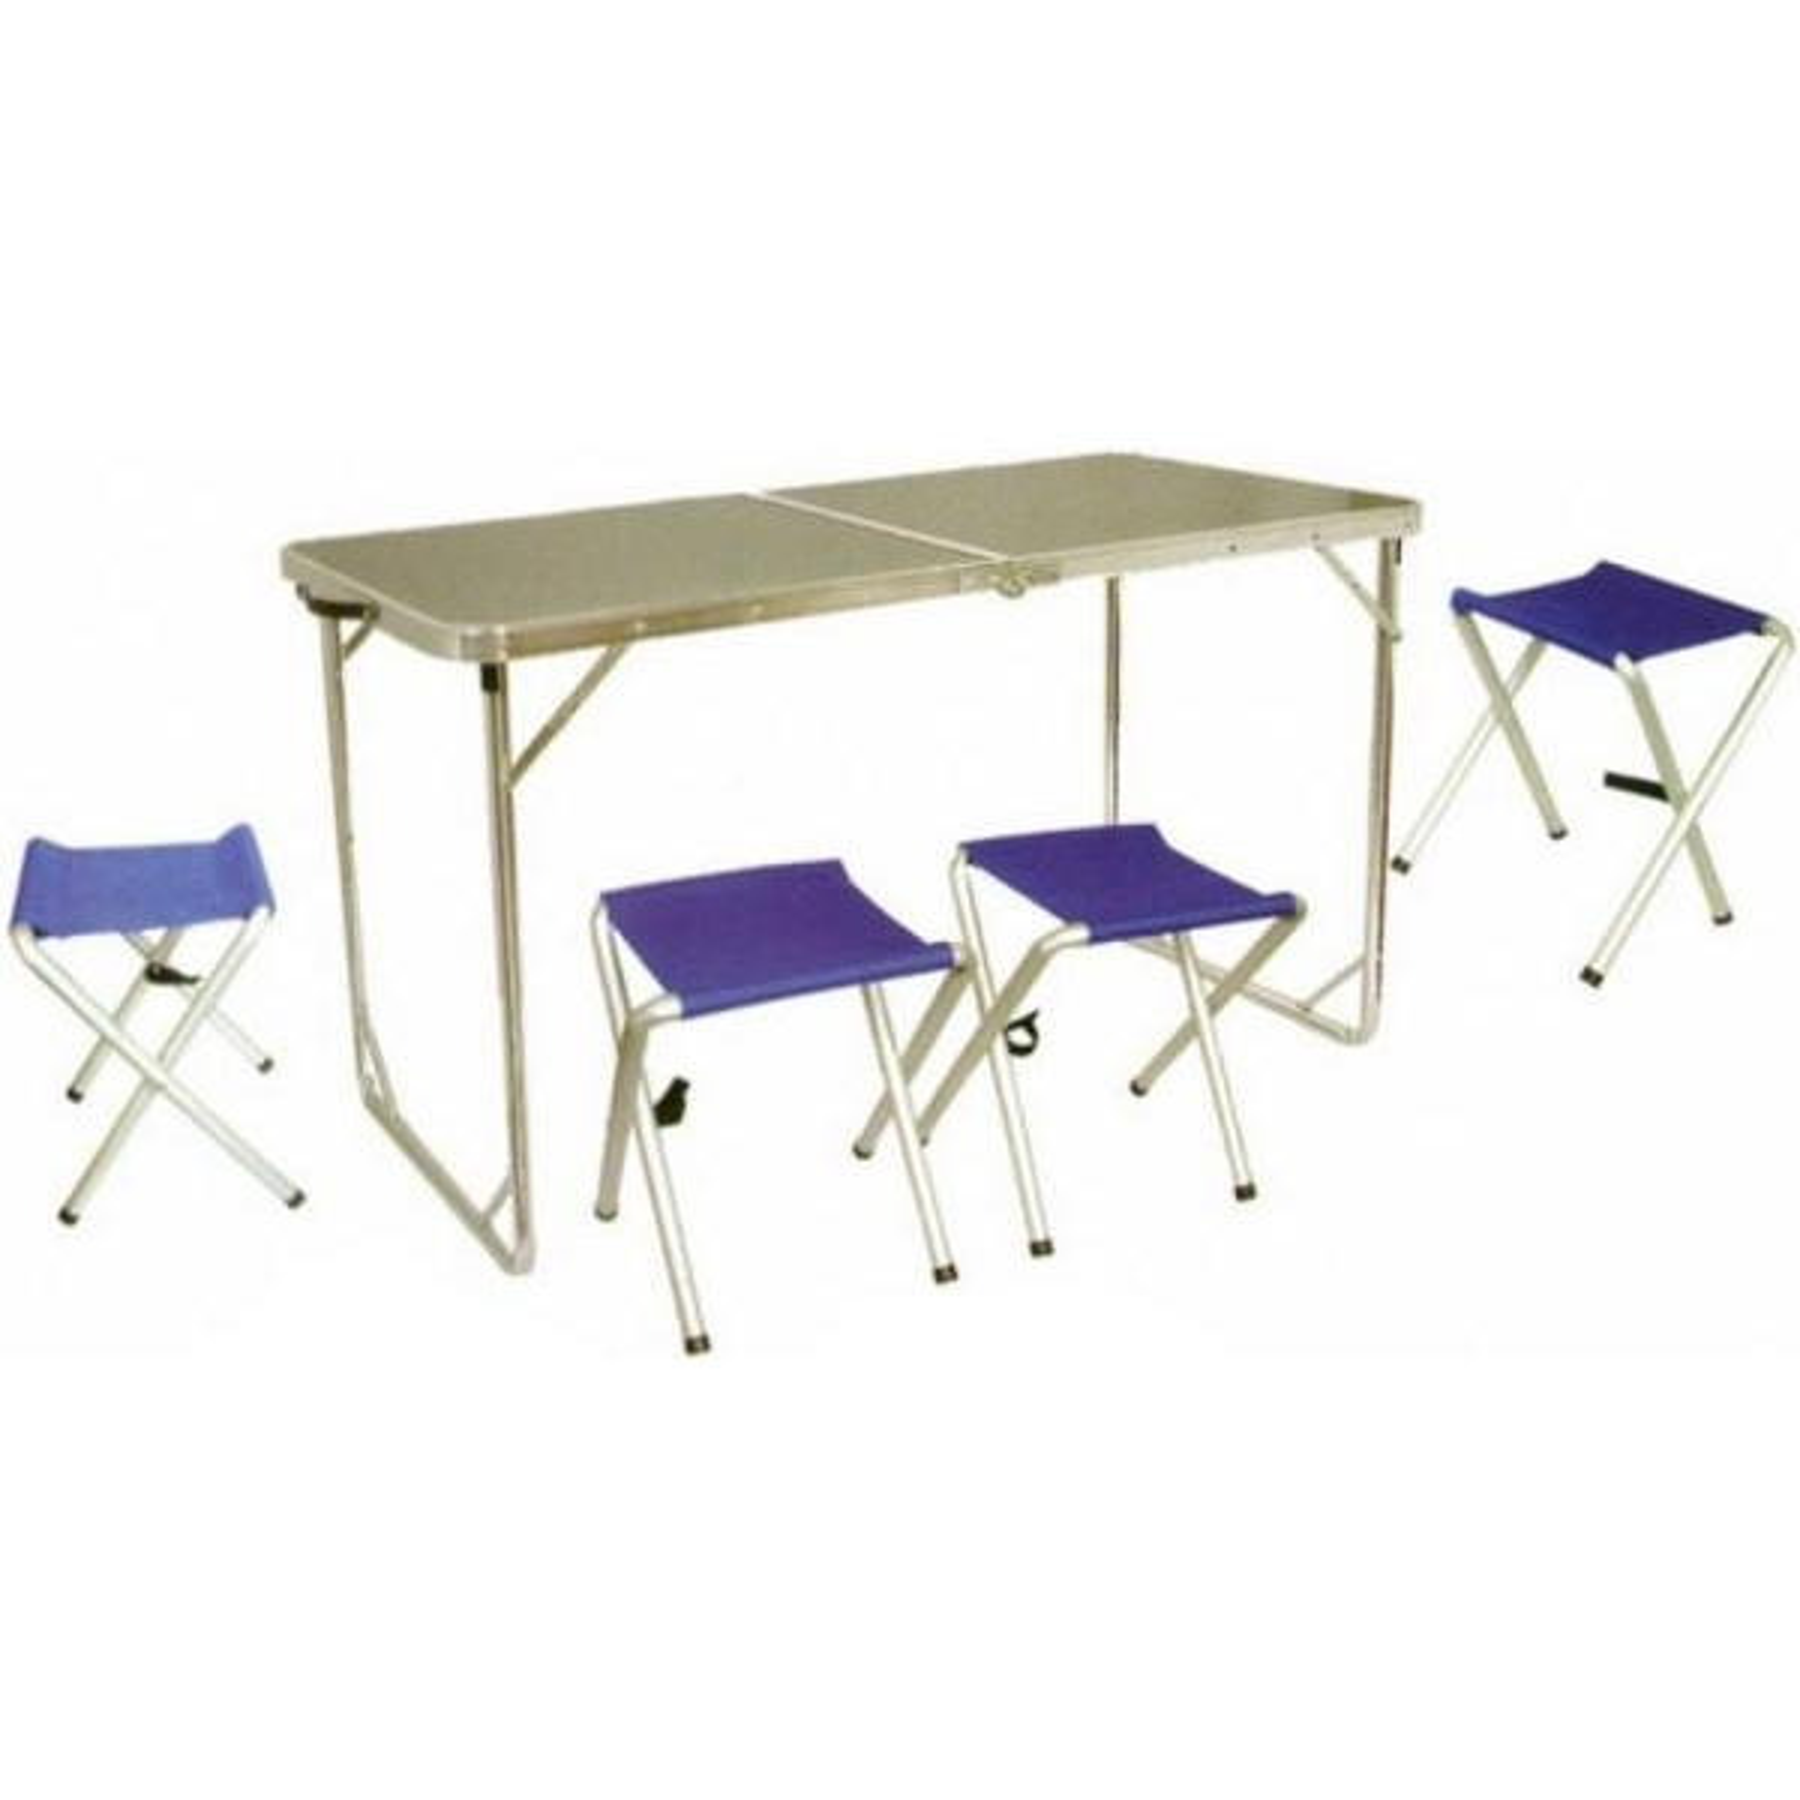 Мебель в кейсе Tramp TRF-005 стол МДФ/алюм 124*62*70см + 4 табурета УЦЕНКА!!!